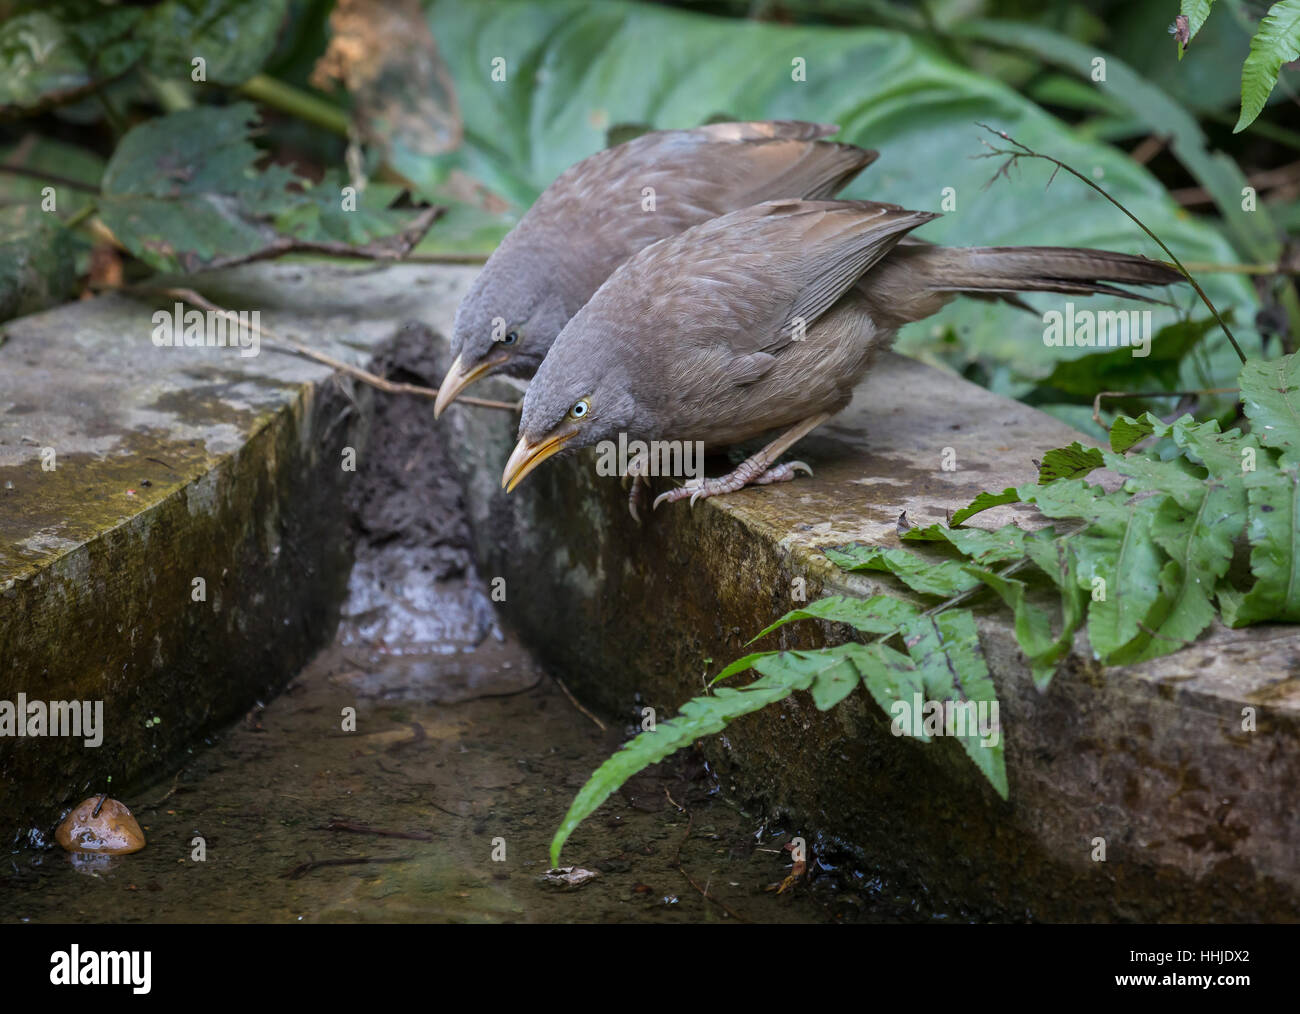 Common Indian birds - the Jungle Babbler pair near a waterhole. - Stock Image